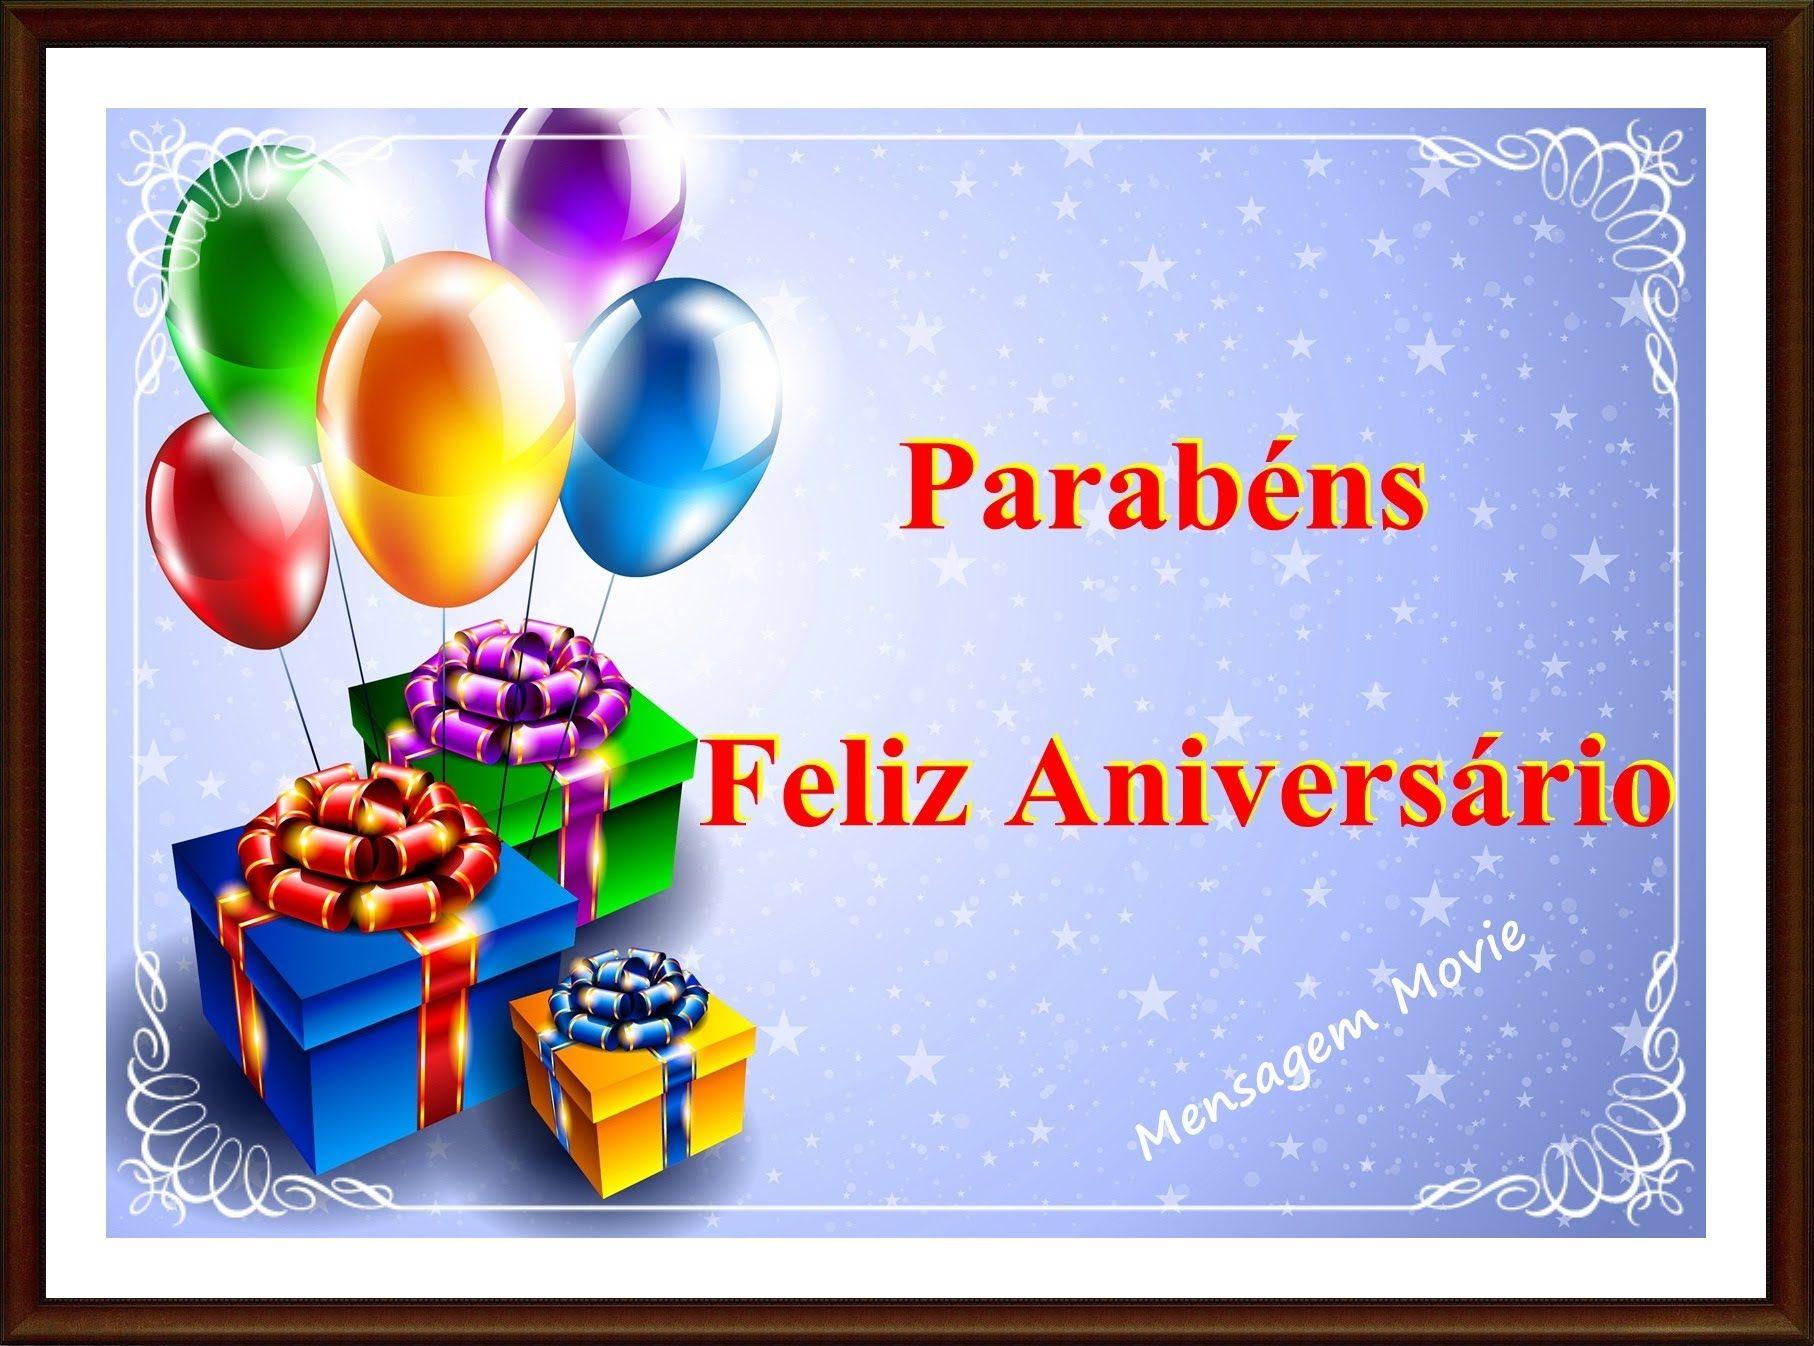 Mensagem Feliz Aniversario Amiga: Feliz Aniversário Amiga - Pesquisa Google